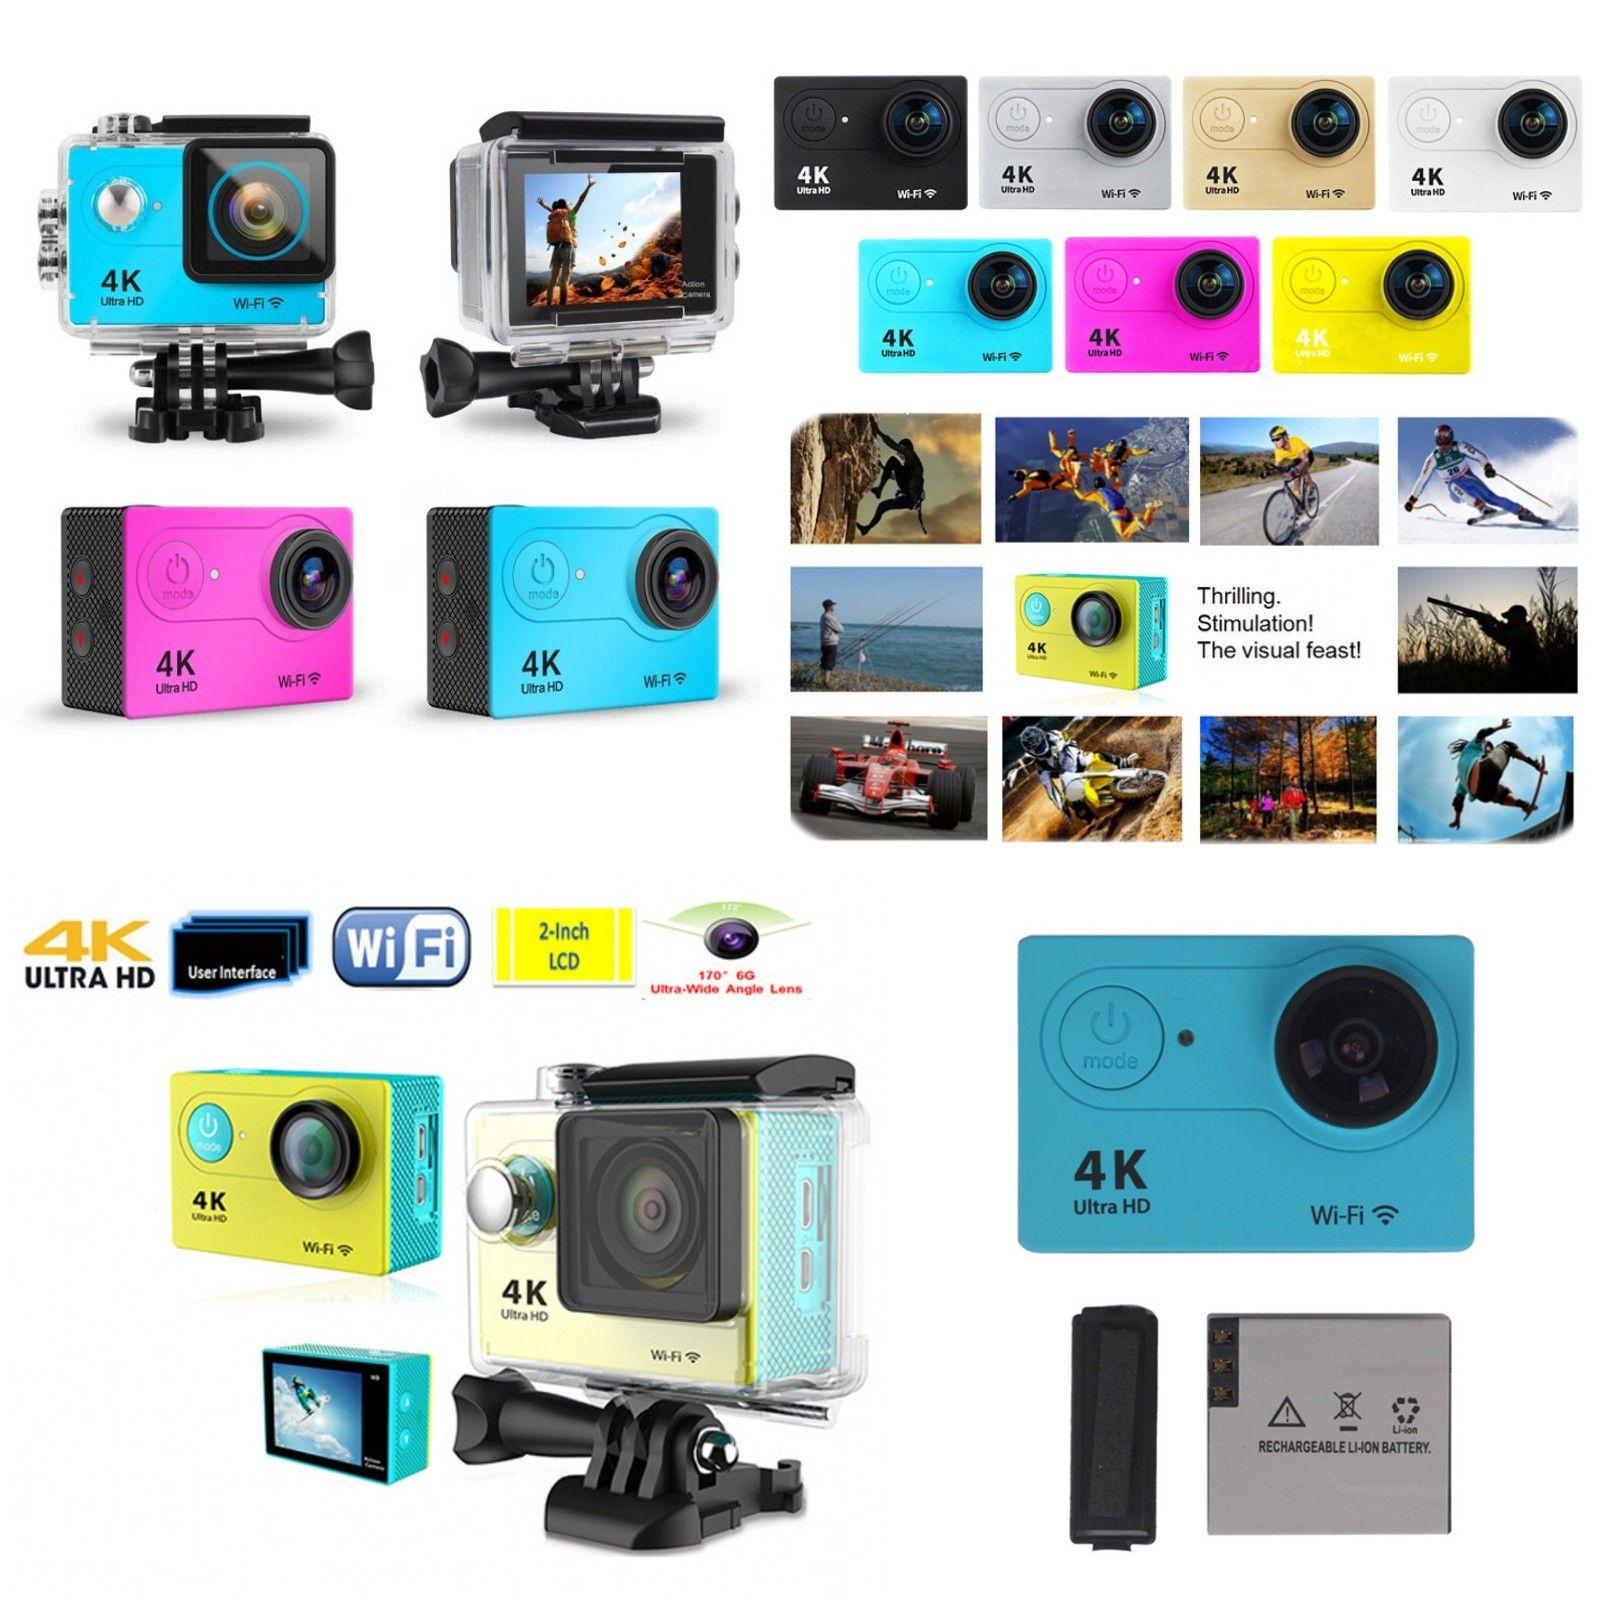 "Ultra Full HD 4K Action Camera 30m Waterproof DVR 2"" Screen 1080P 12MP Remote Control Sport WIFI Extreme Helmet Camcorder Car Cam DV"